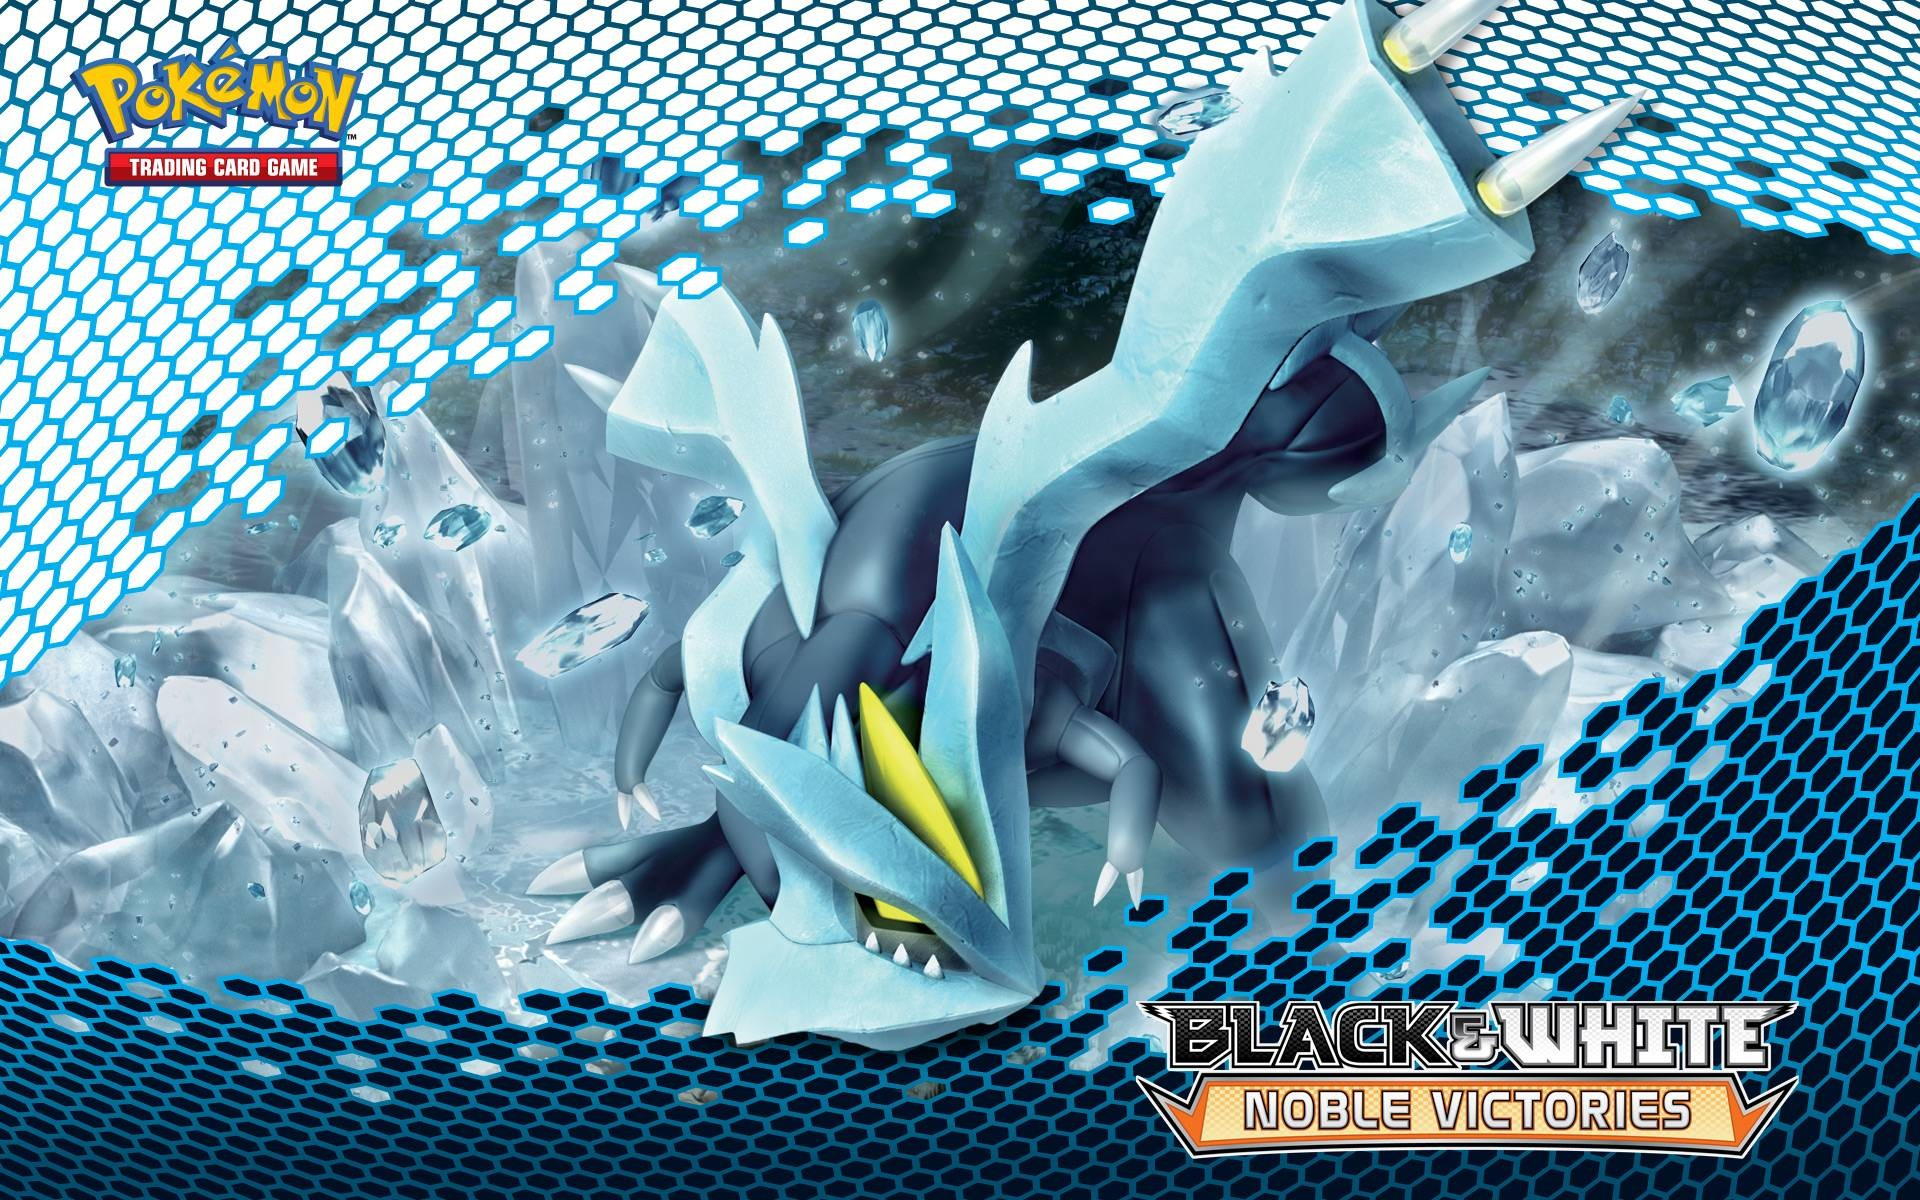 The Official Pokémon Website | Pokemon.